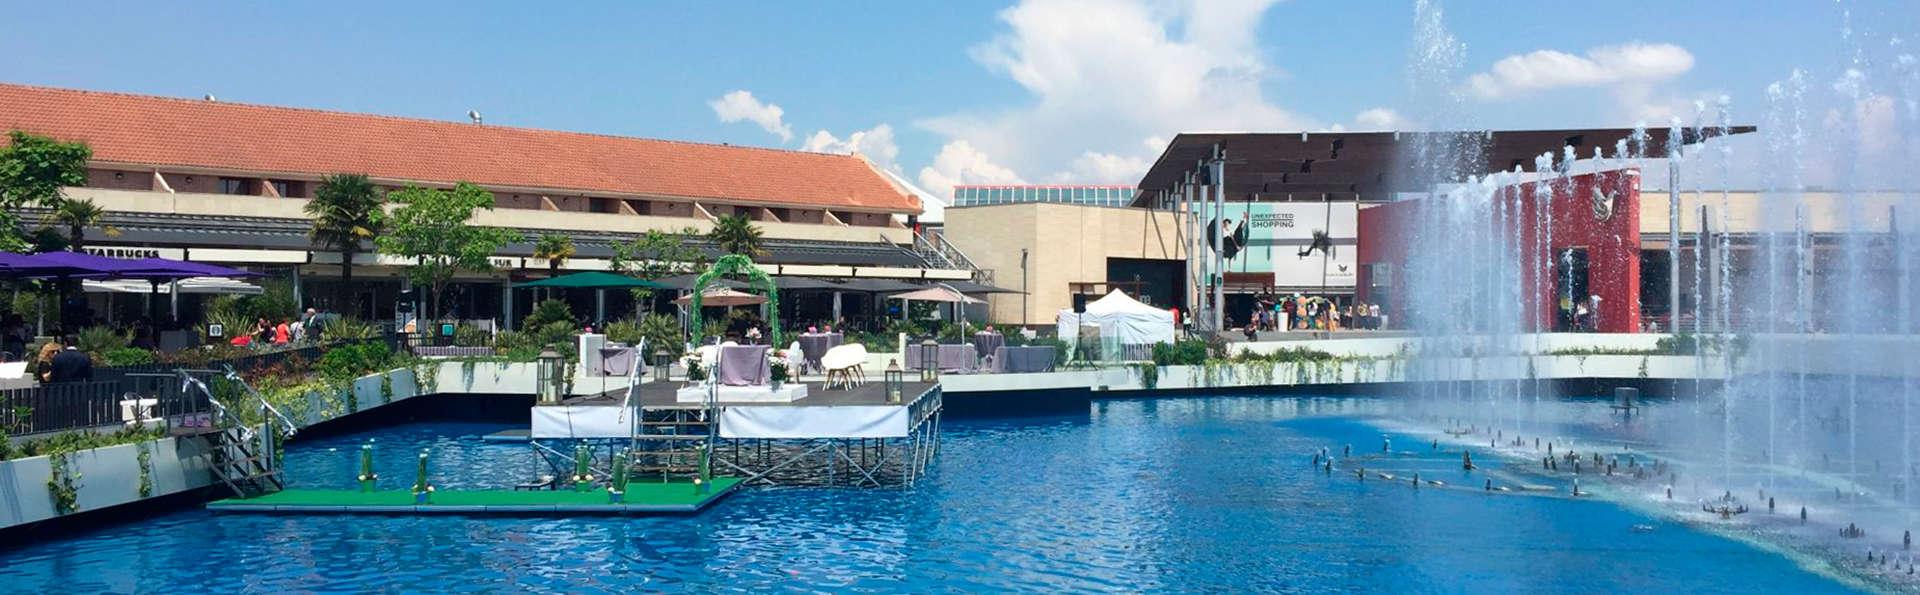 Hotel AR Parquesur - EDIT_exterior1.jpg